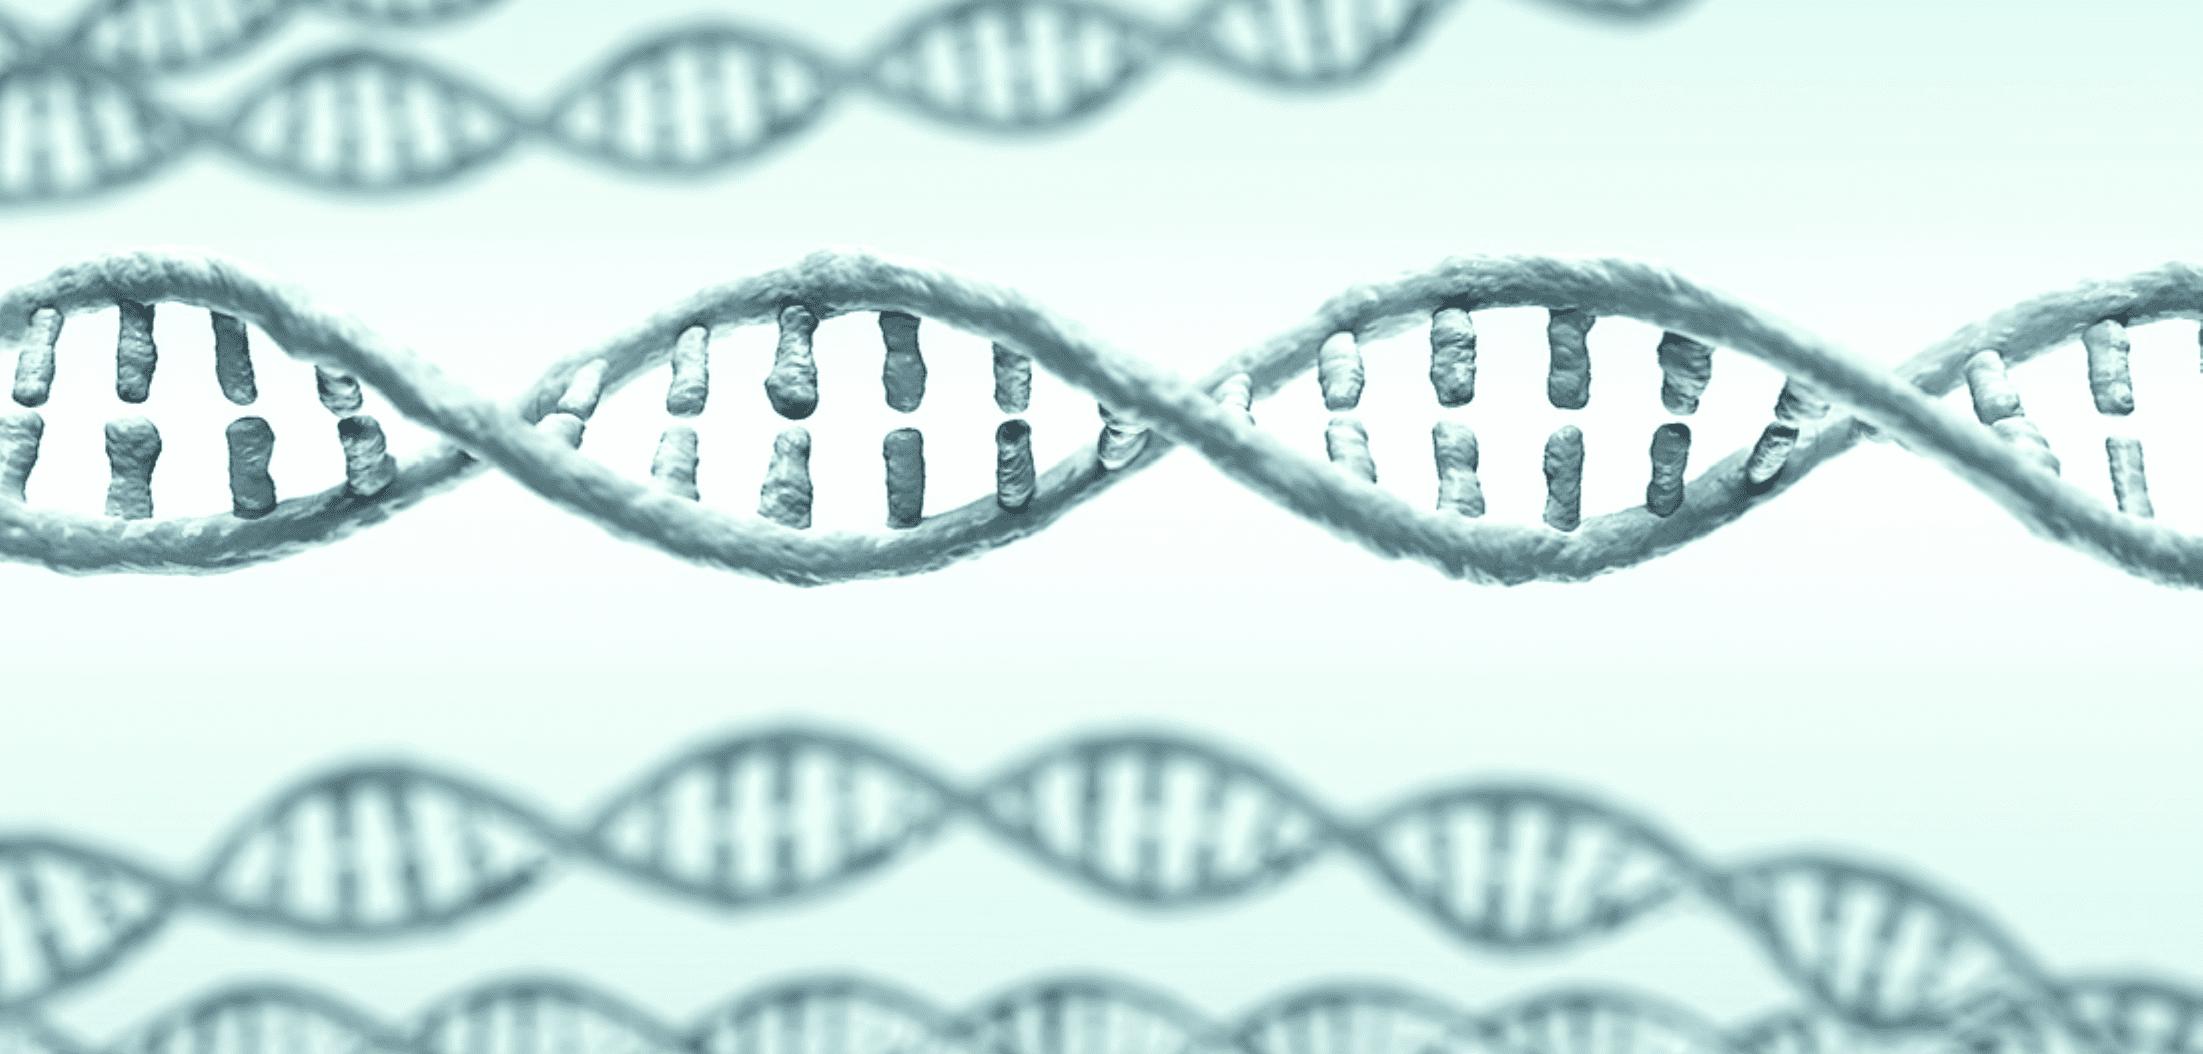 Cartoon representation of a DNA double helix